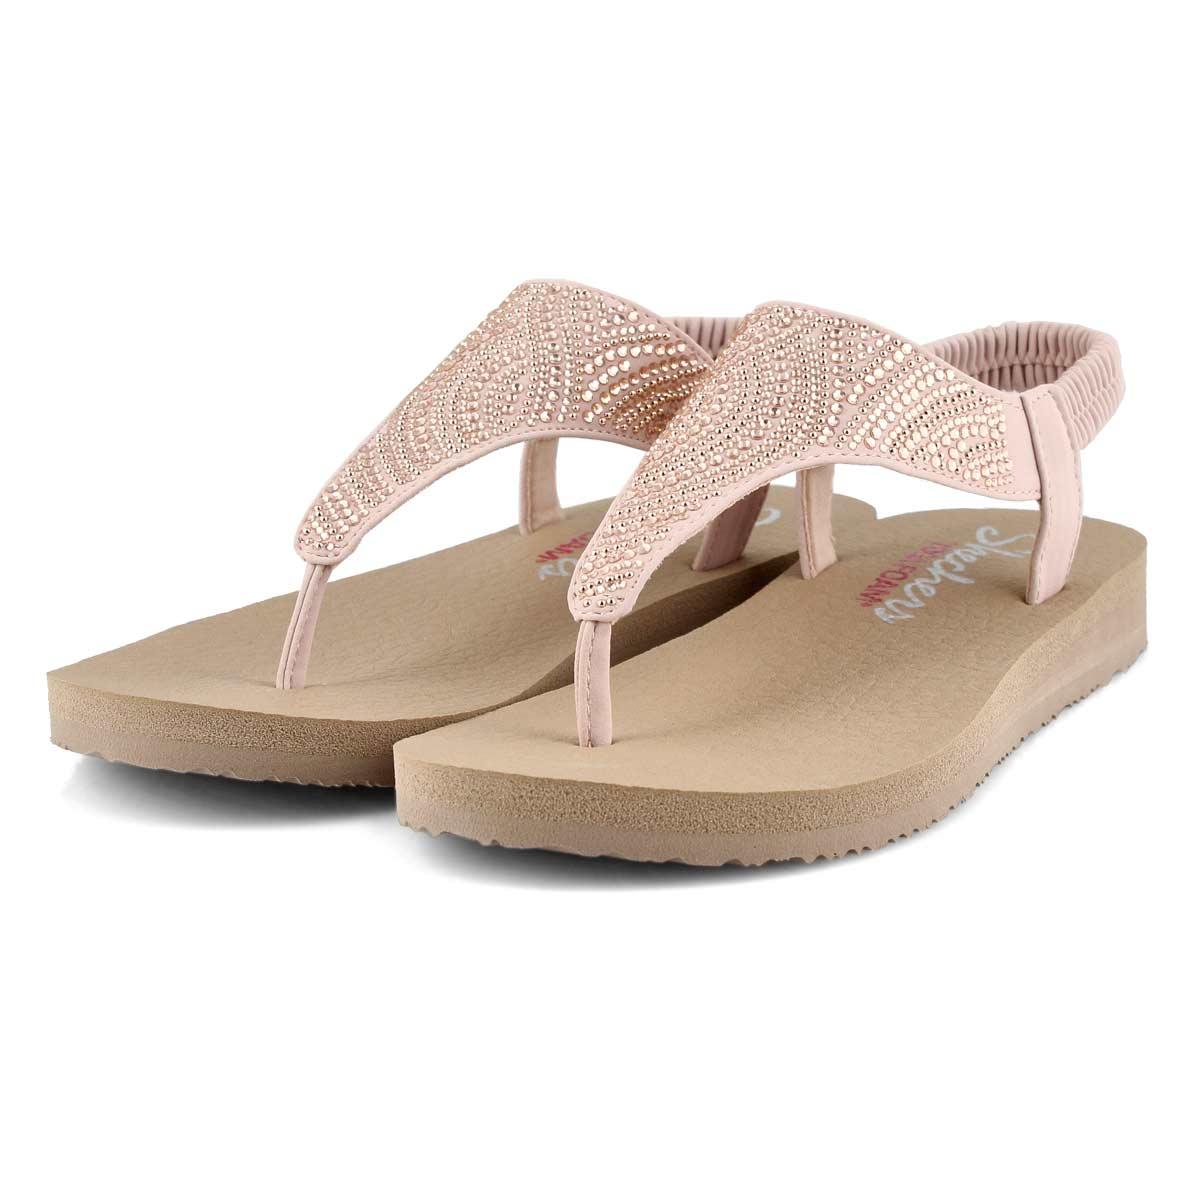 Women's Meditation Sandal - Blush